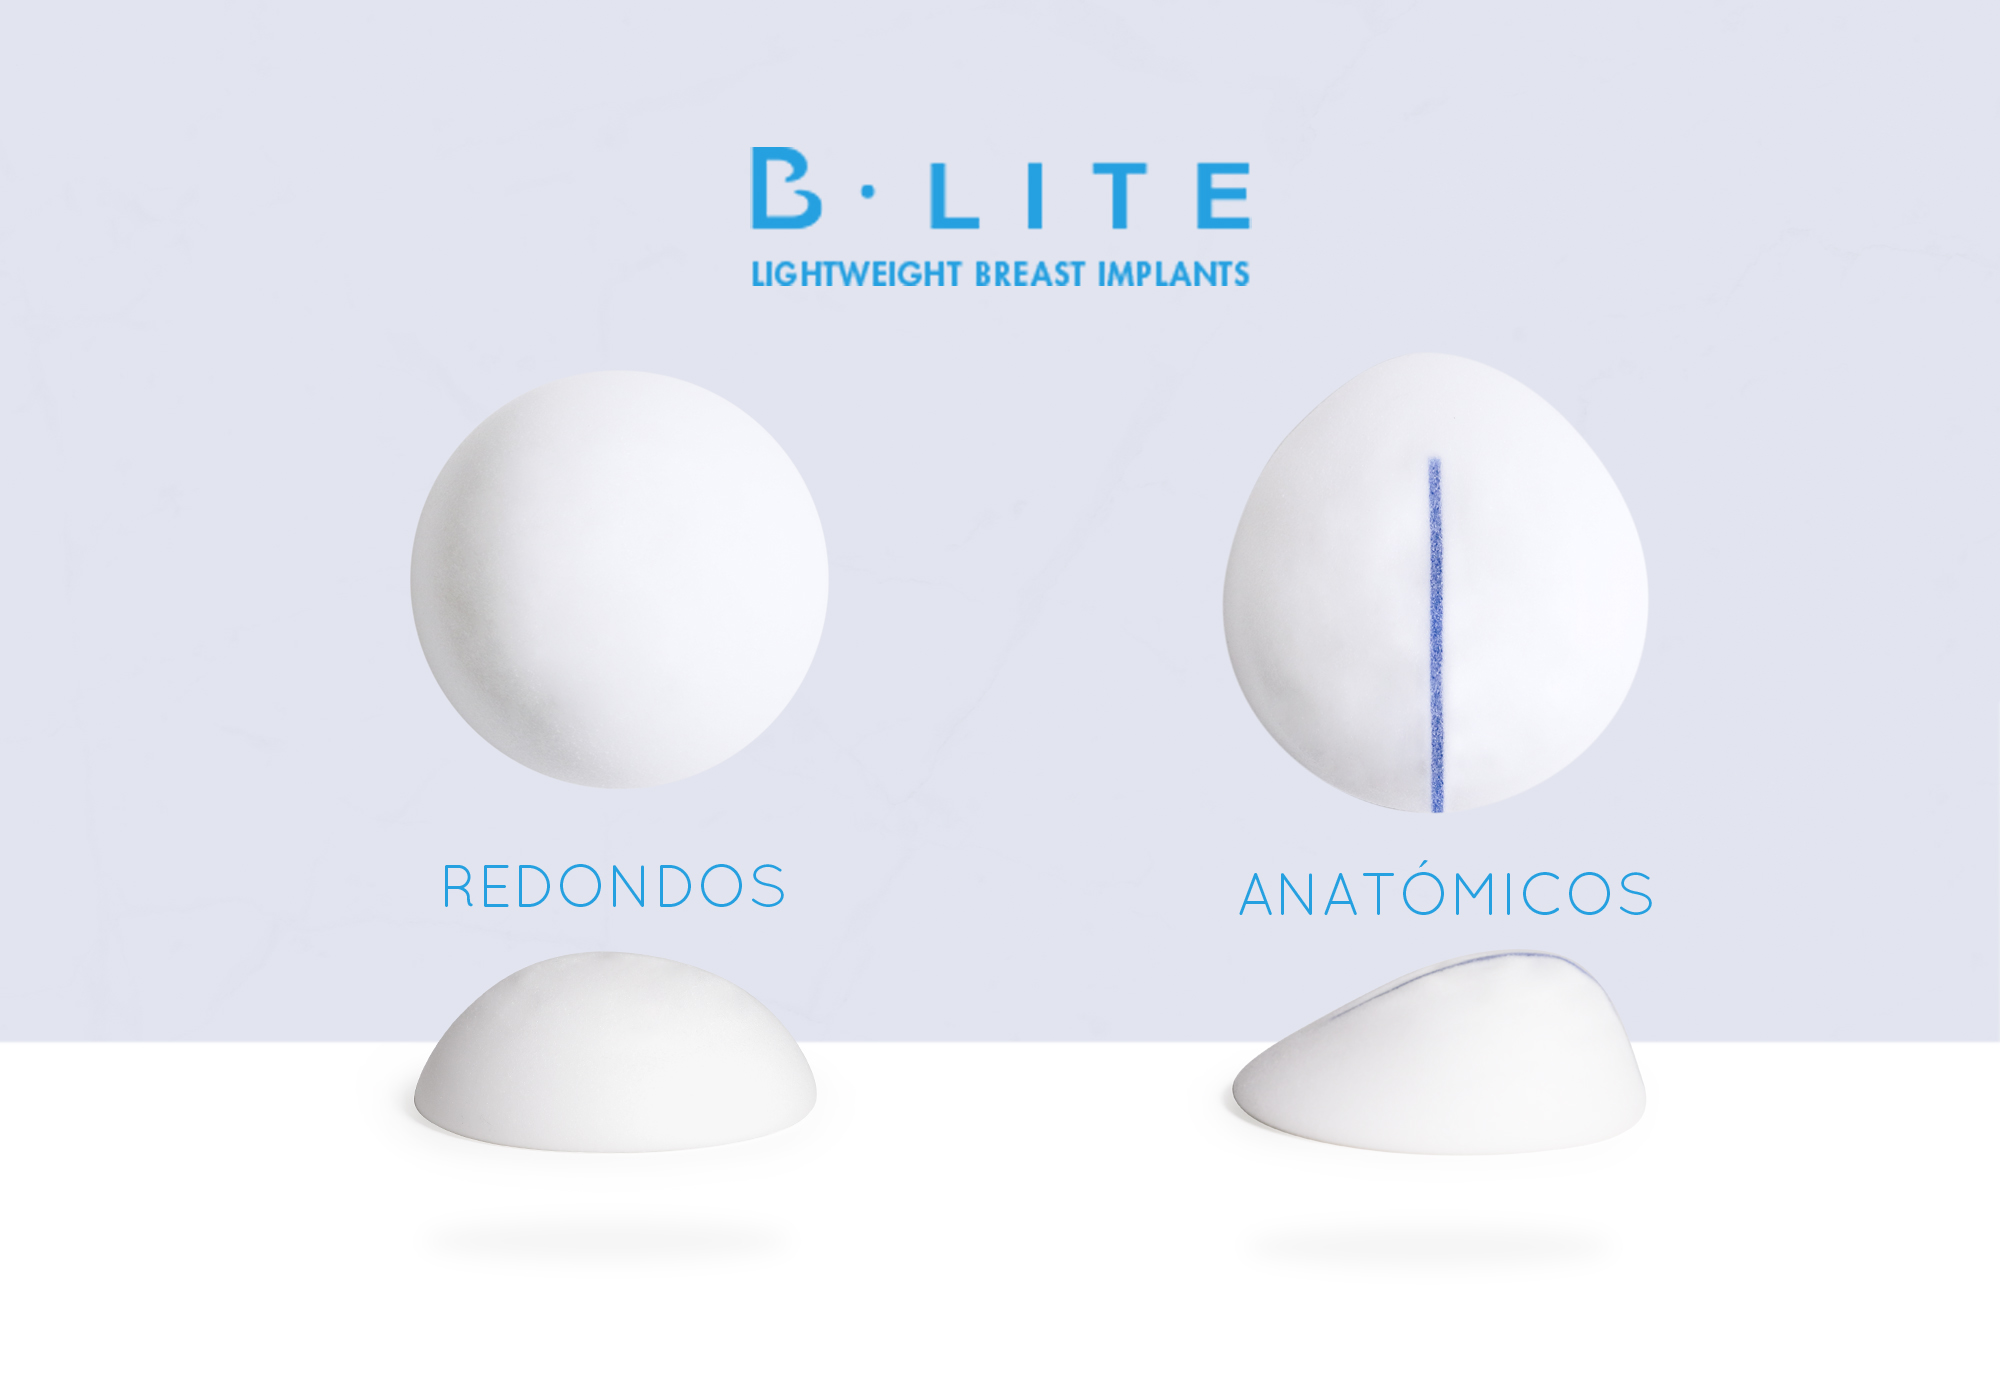 Prótesis ligeras con implantes b-lite